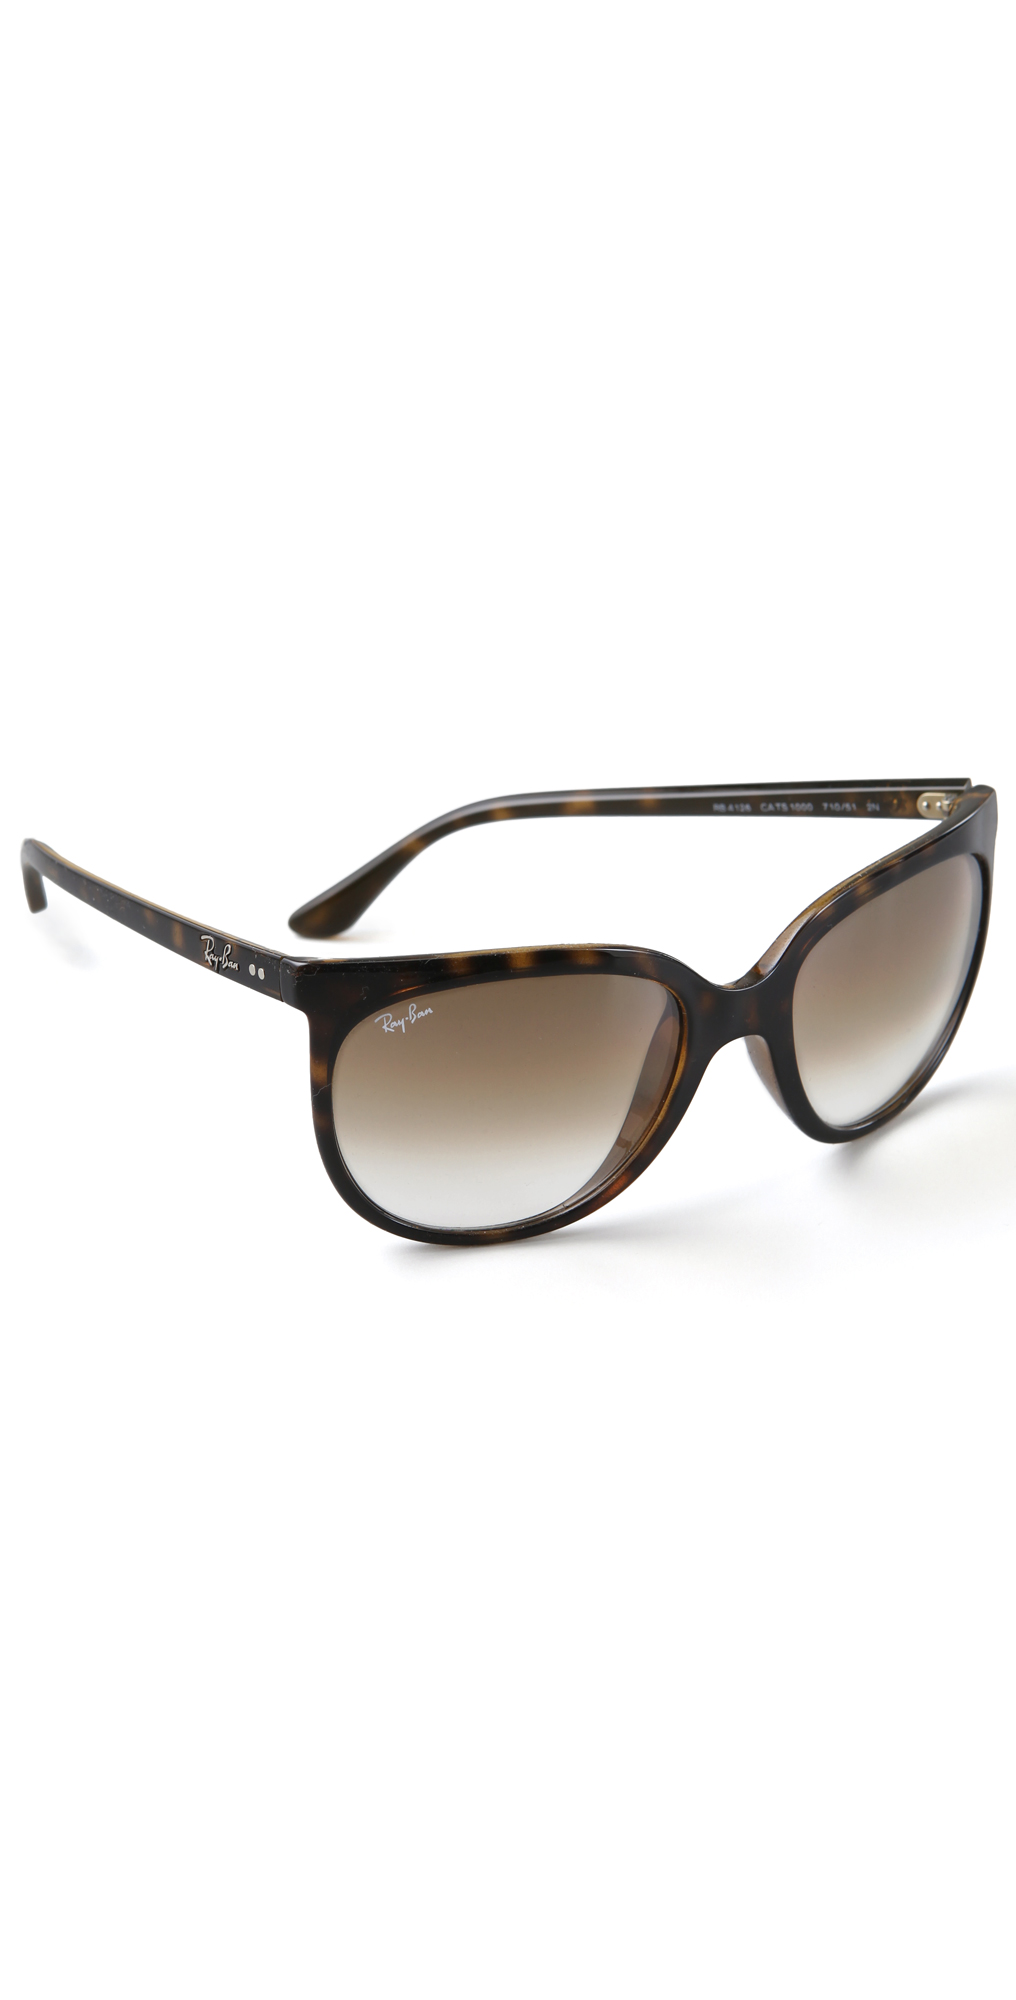 ray ban polarized sunglasses costco nz